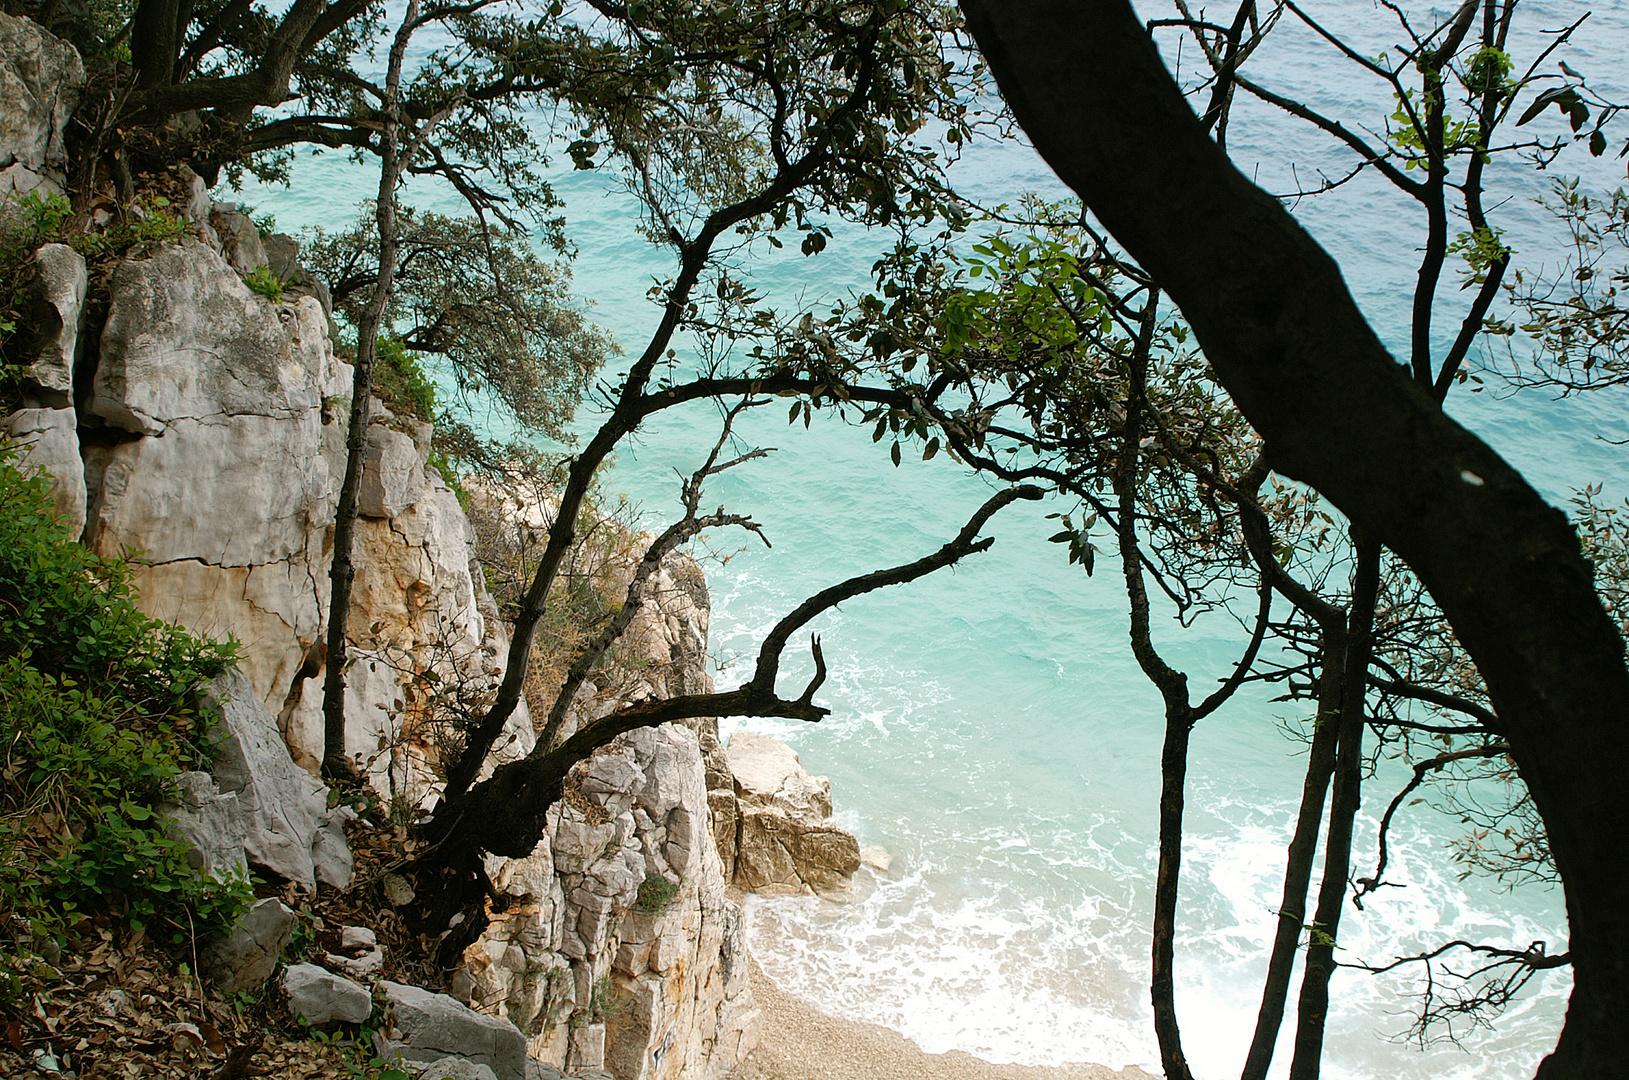 Masenicka Bucht